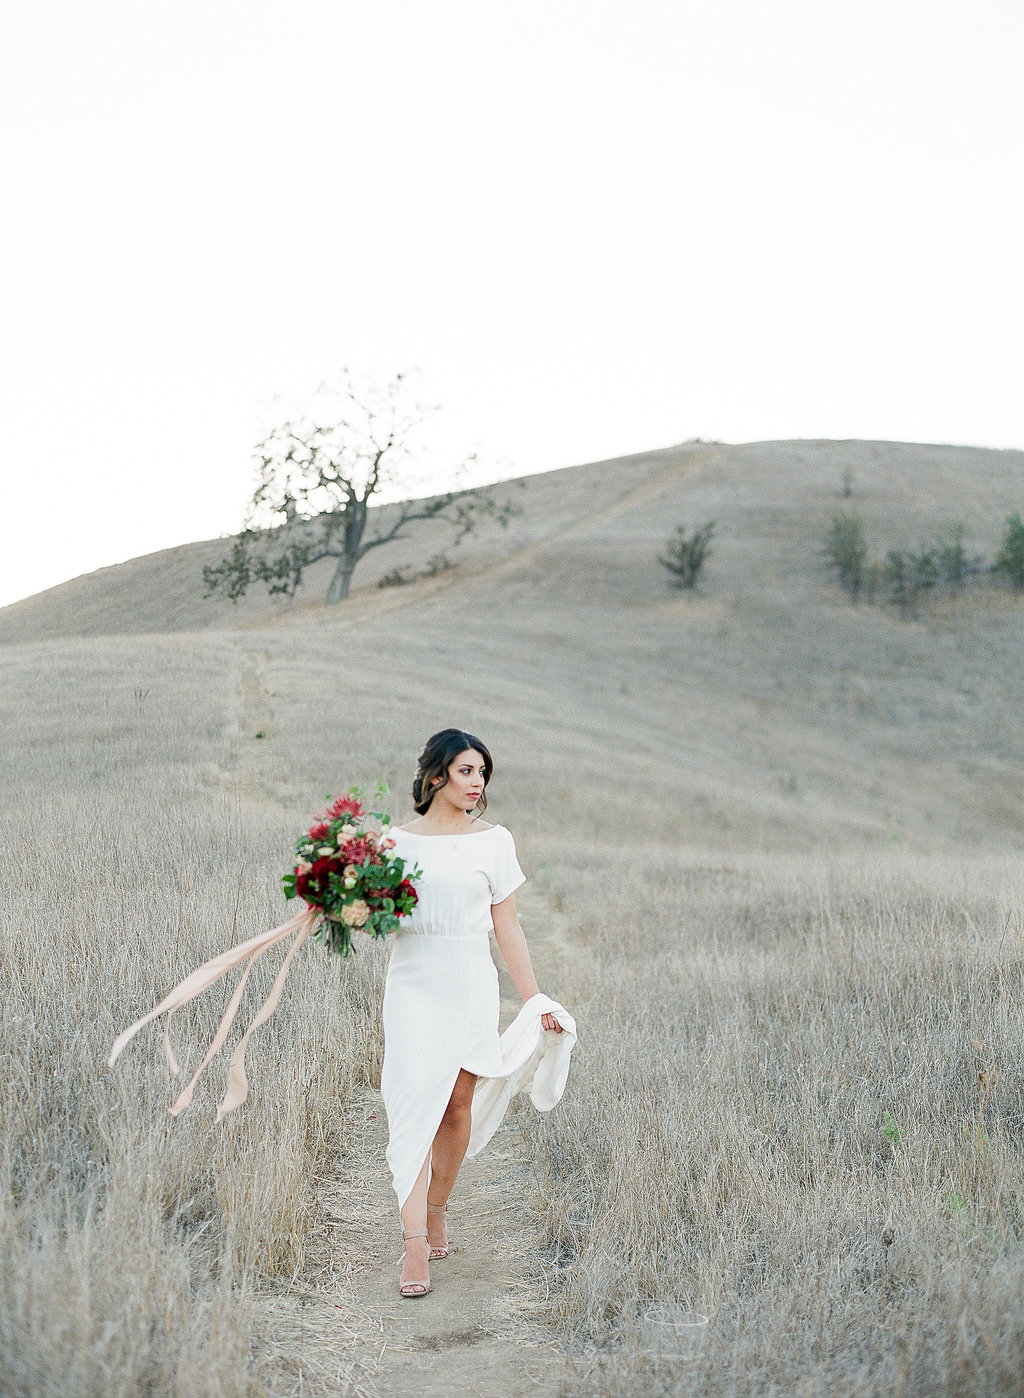 1_Photoby SamanthaKirk_Floral by Ellamah_LateFall.jpg